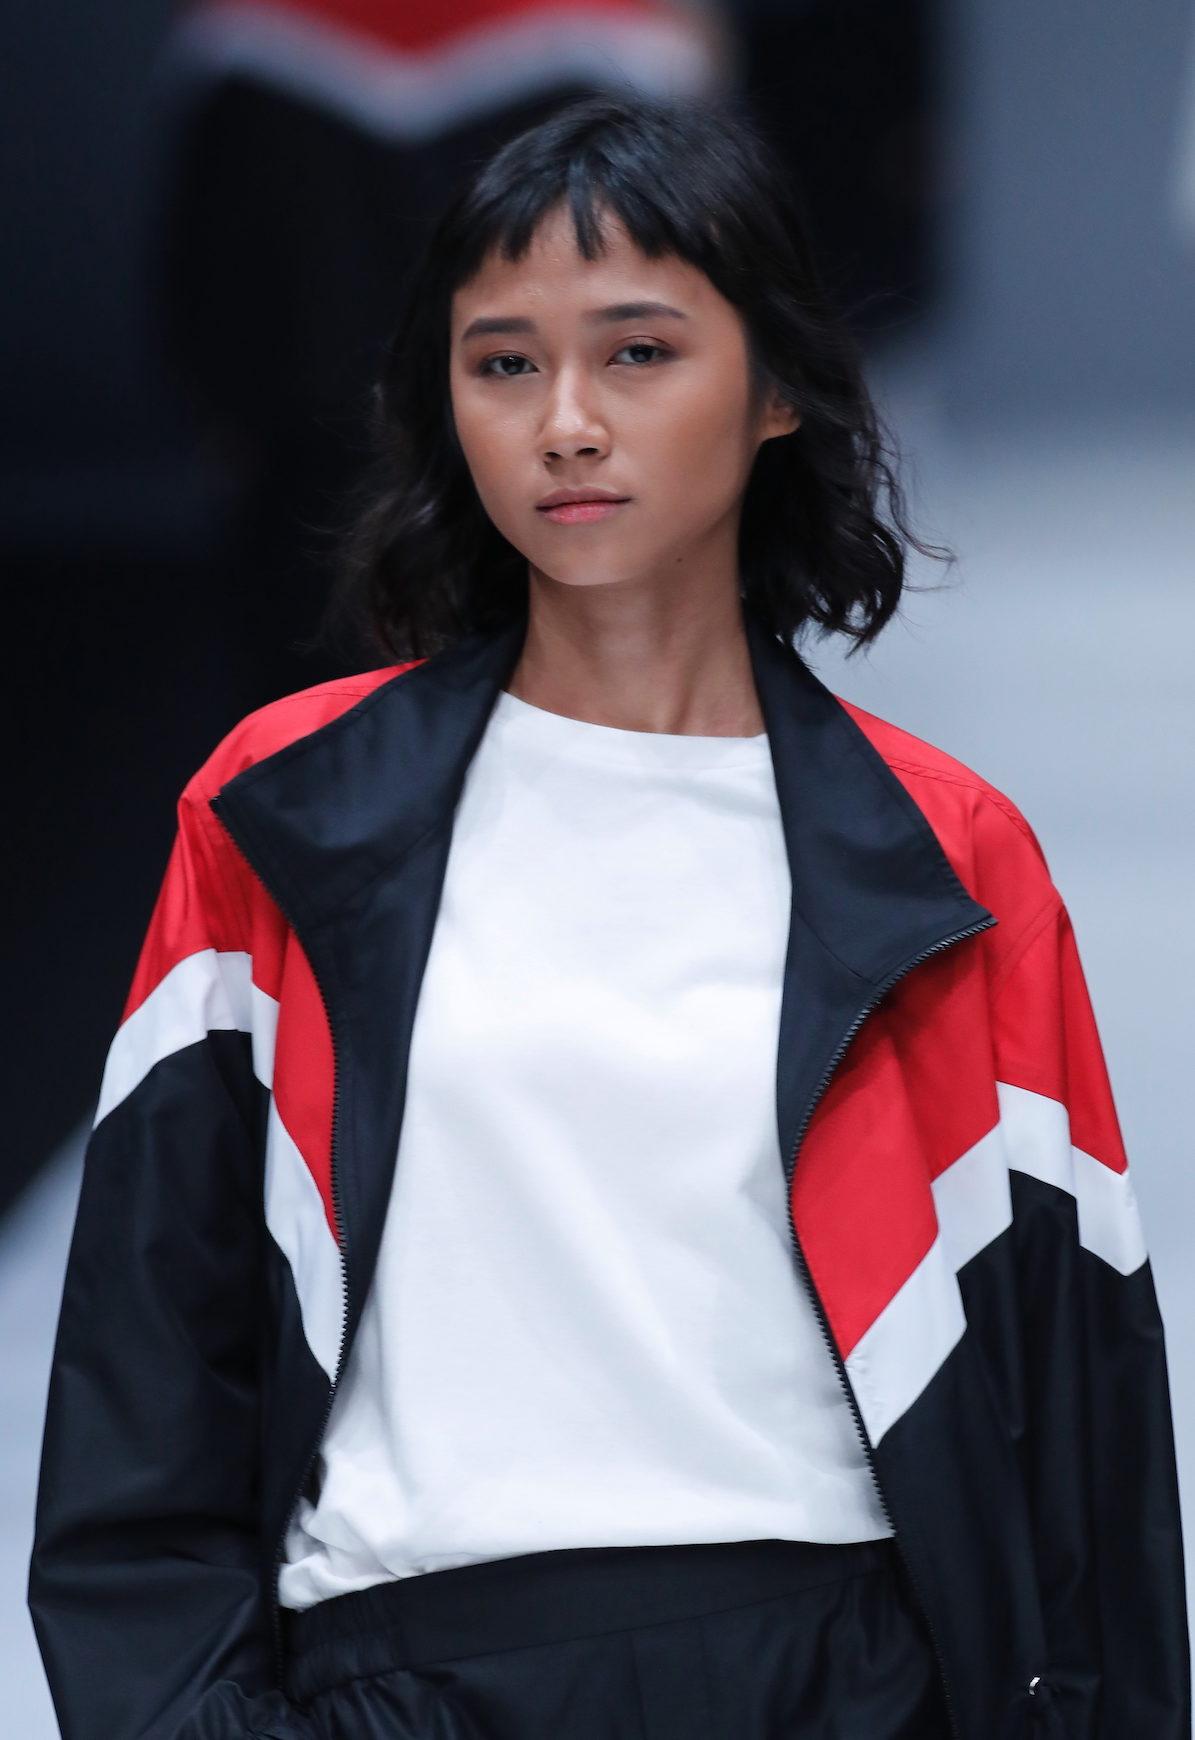 Tren model rambut runway gaya micro bangs jfw 2018 Rani Hatta